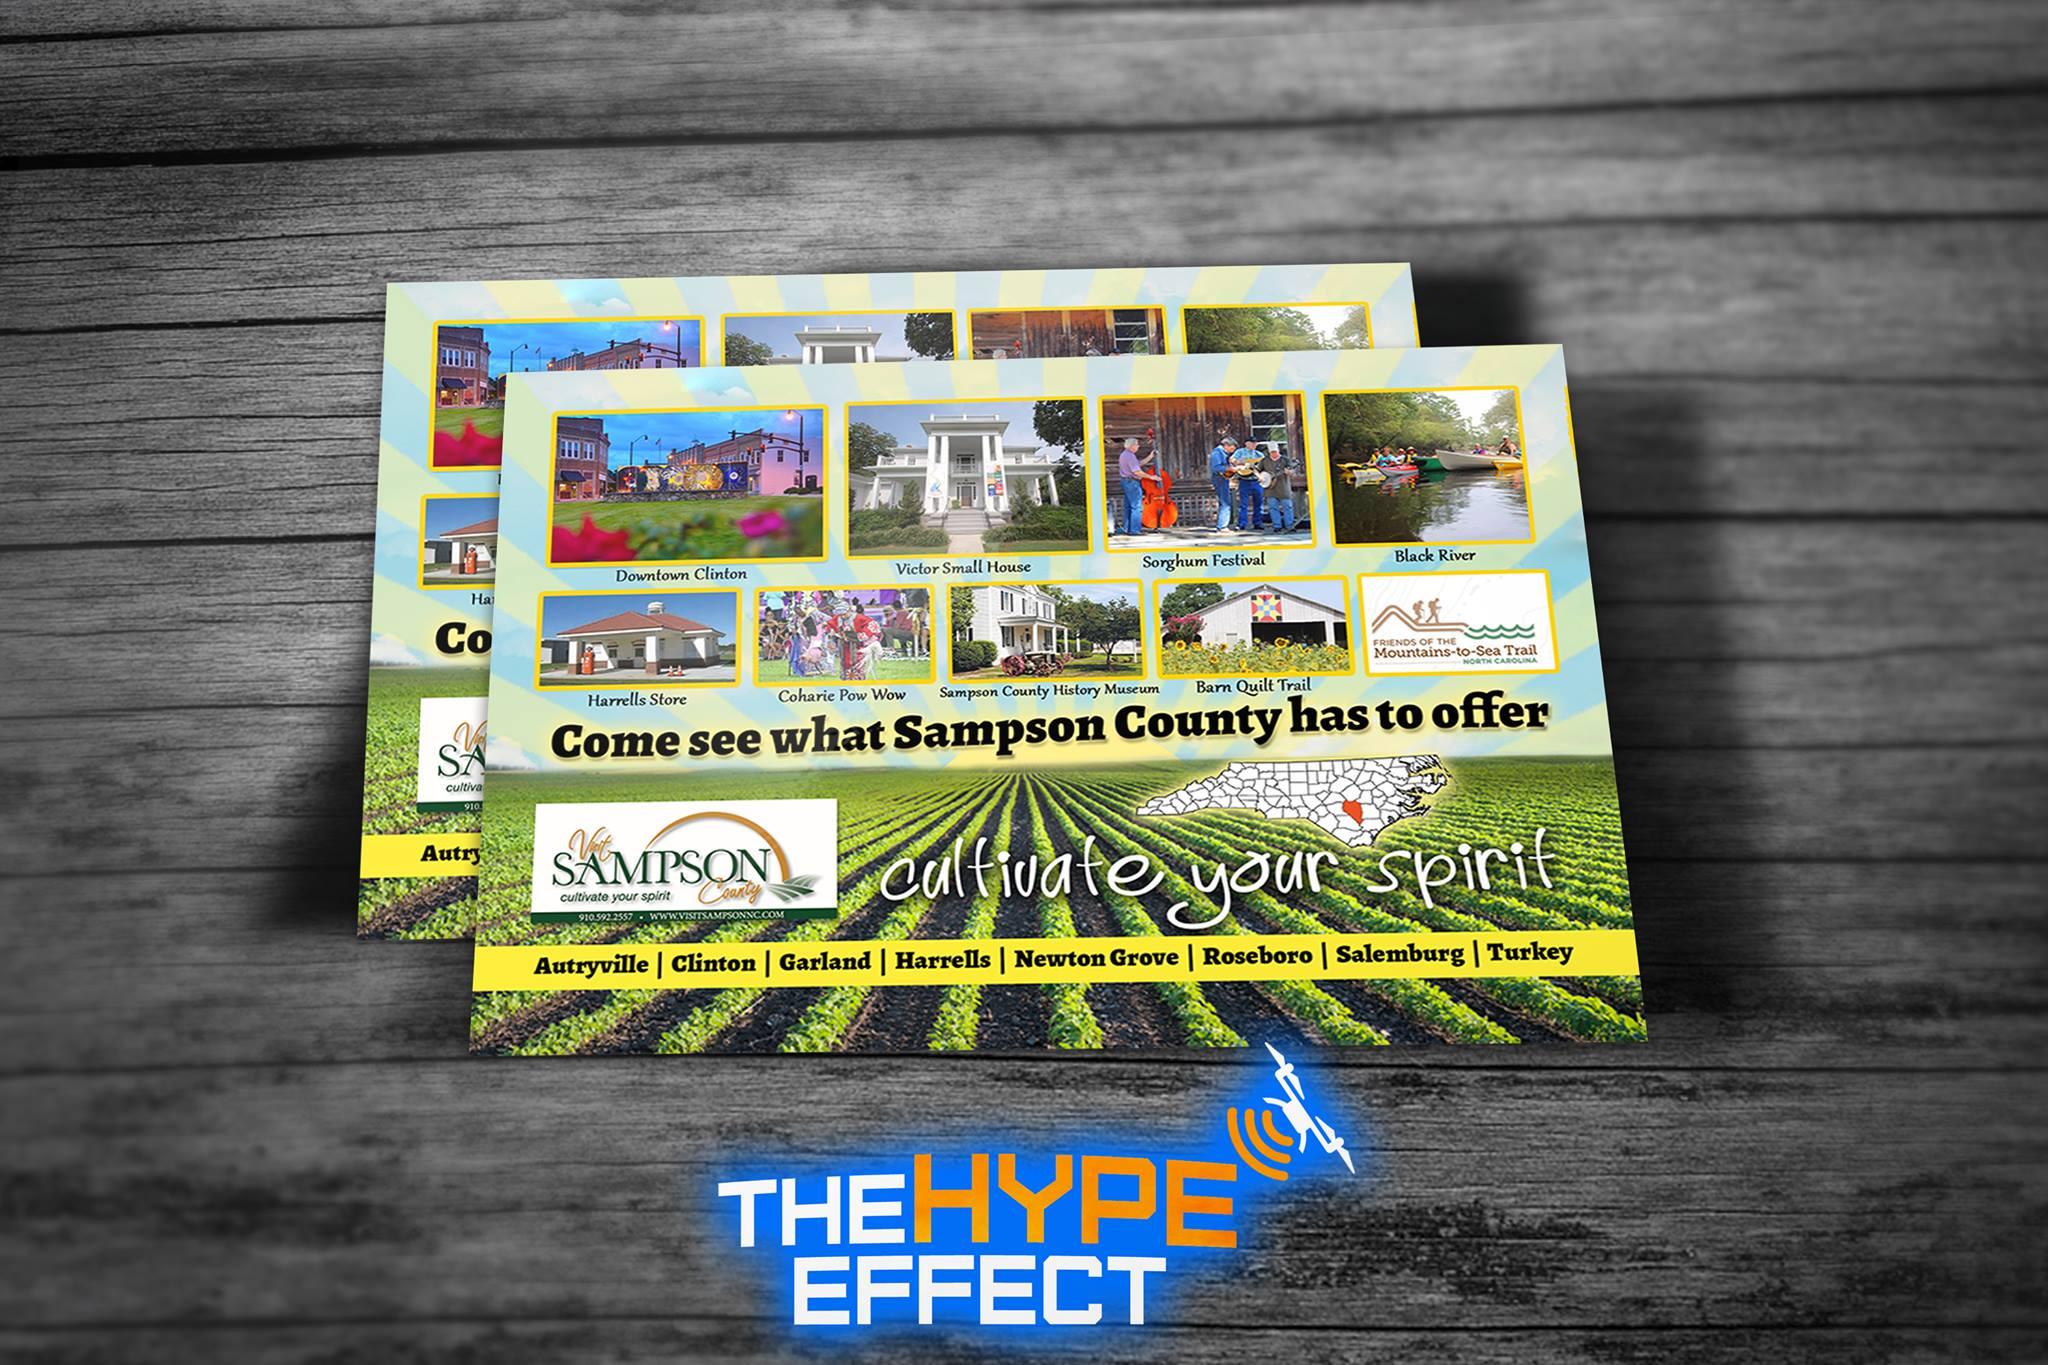 cvb-postcard-2-v3.jpg